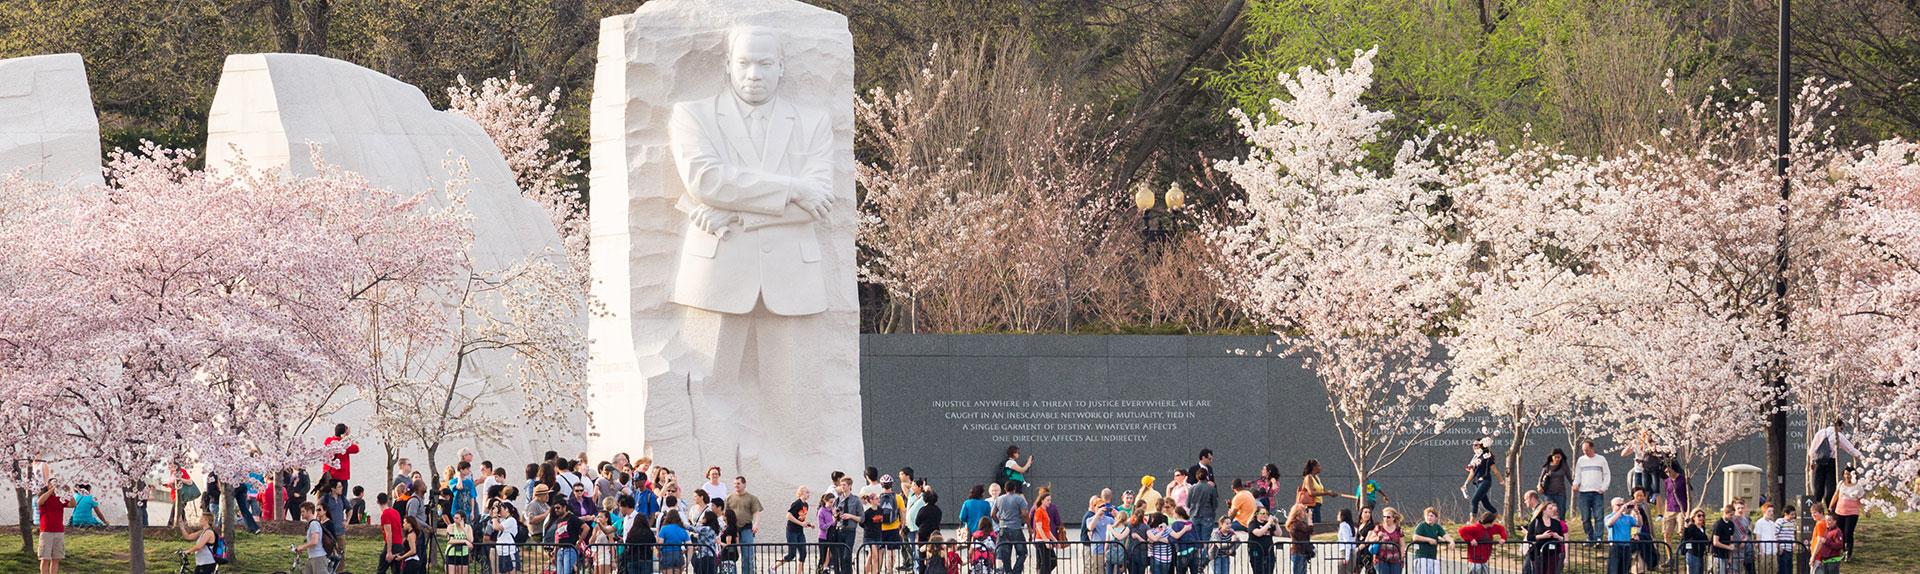 MLK Memorial in Washington, District of Columbia